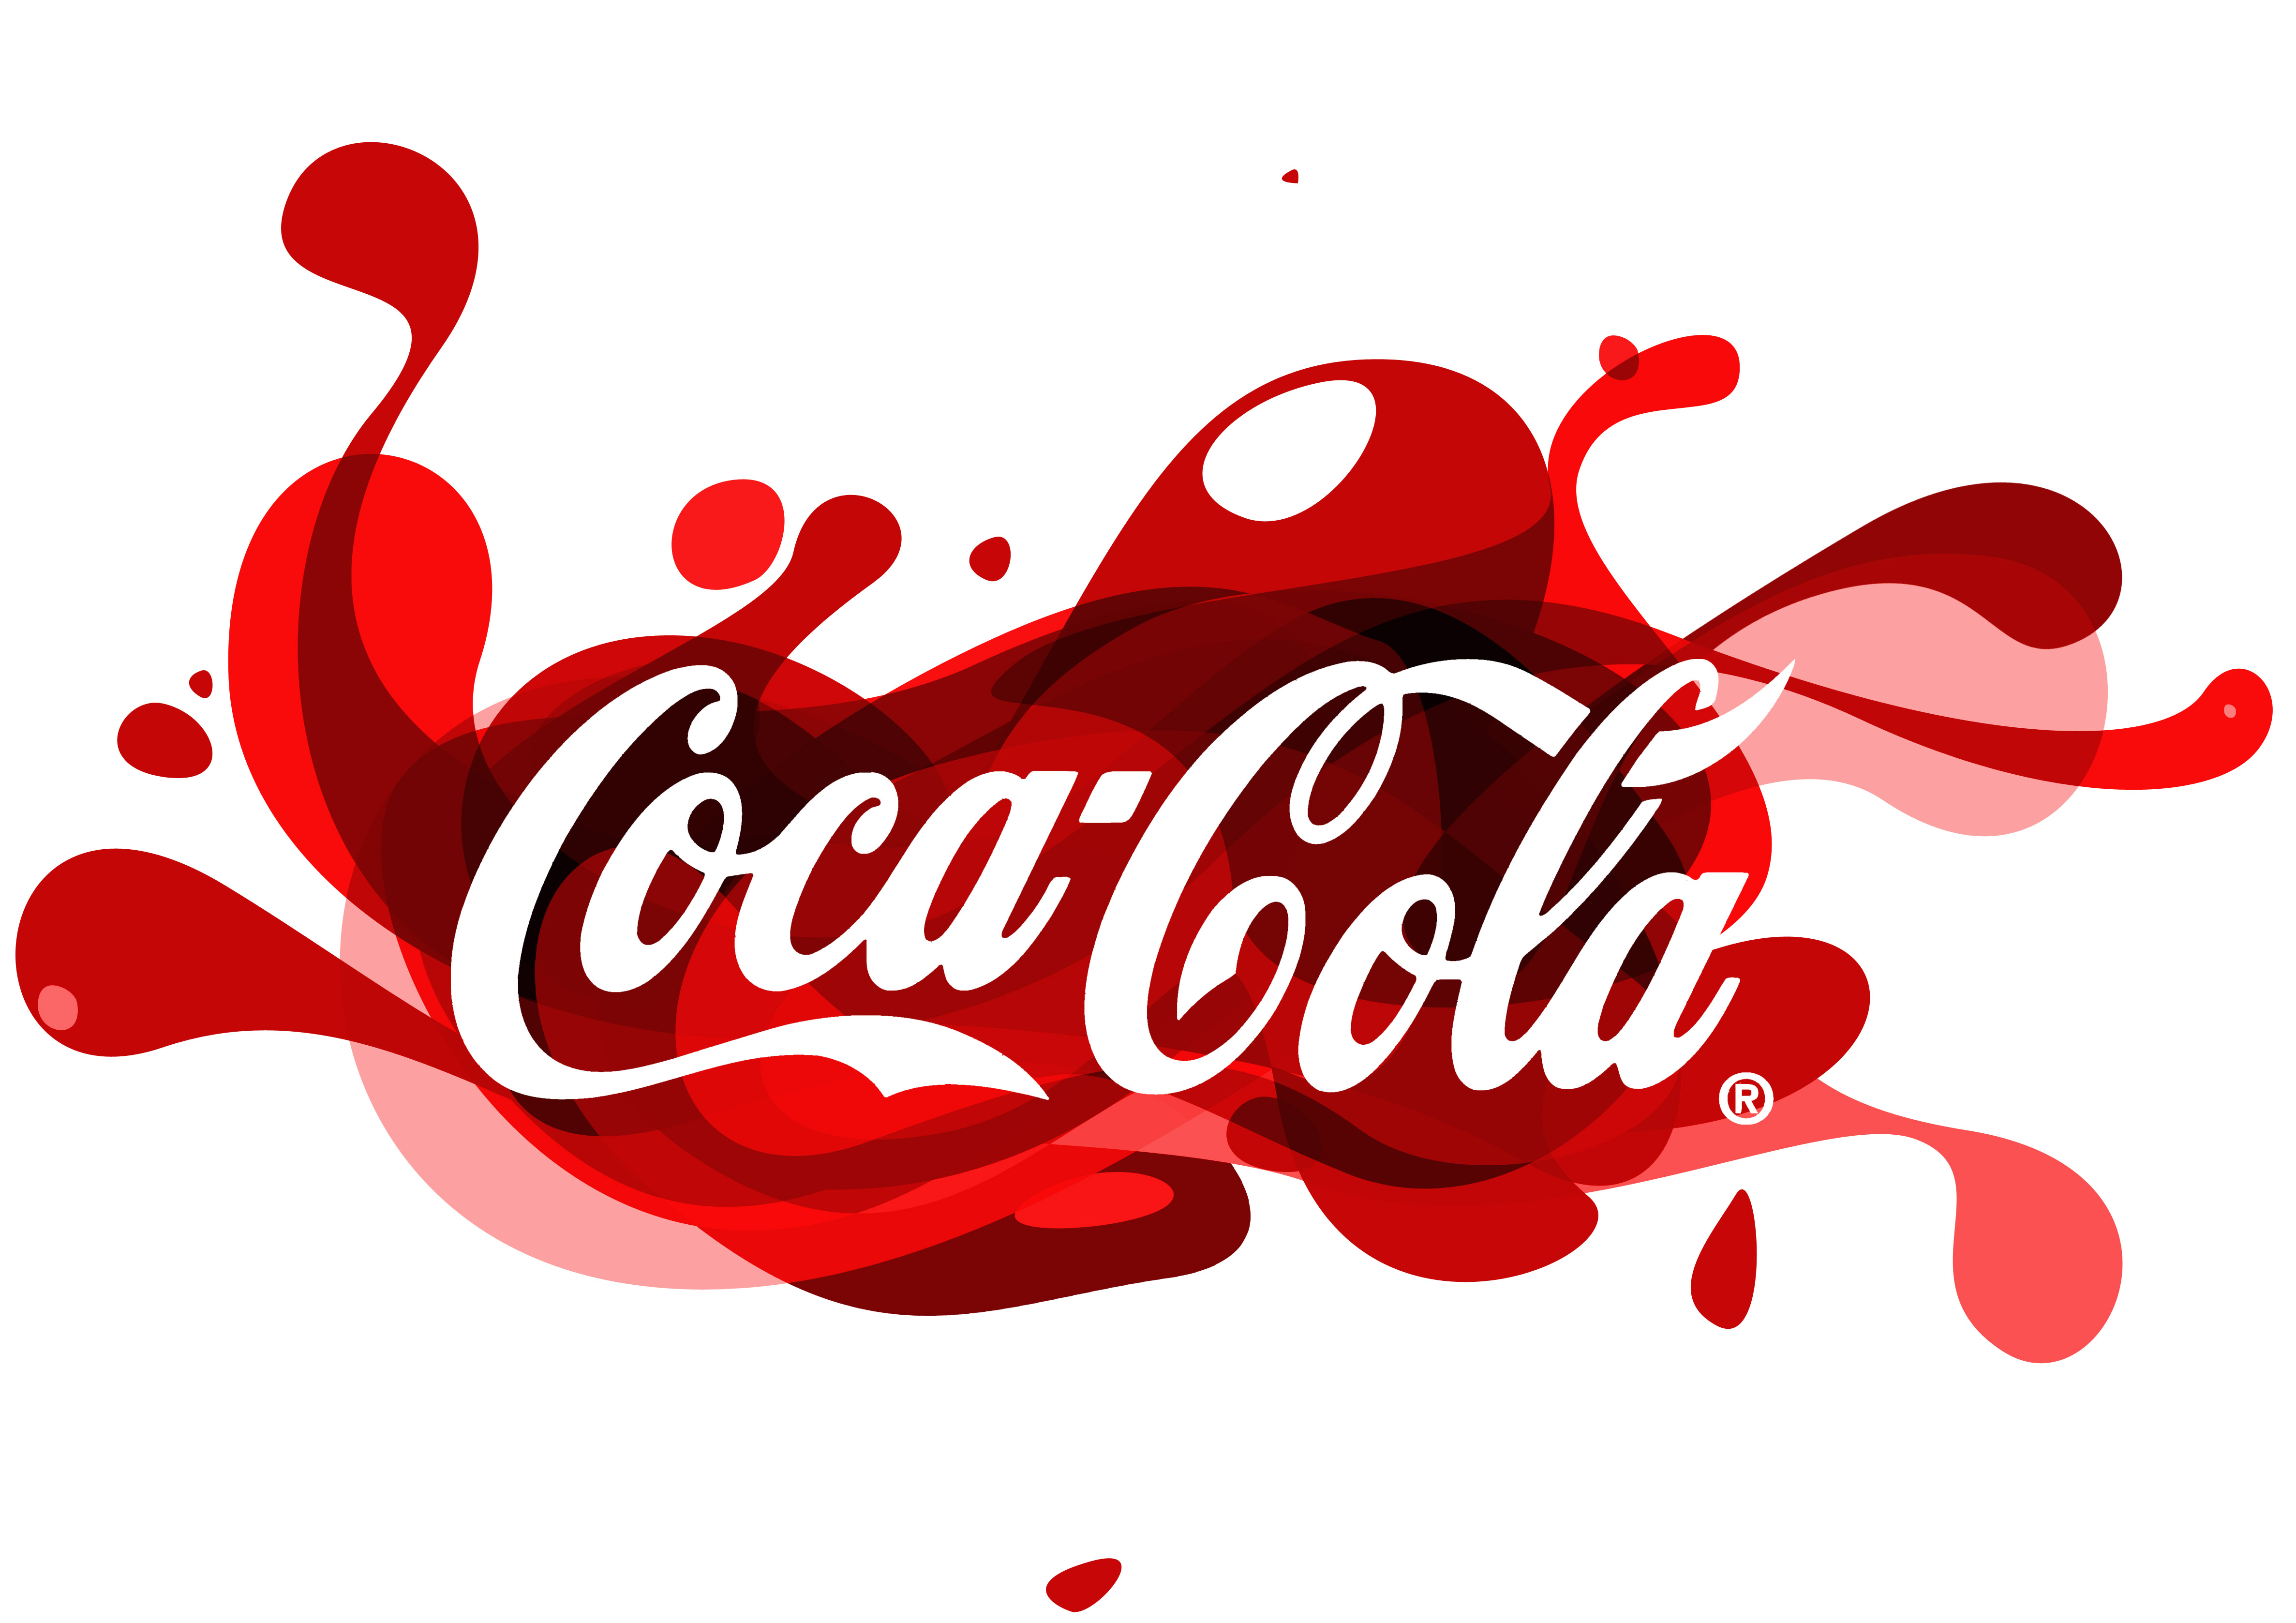 Coca_cola_logo-3